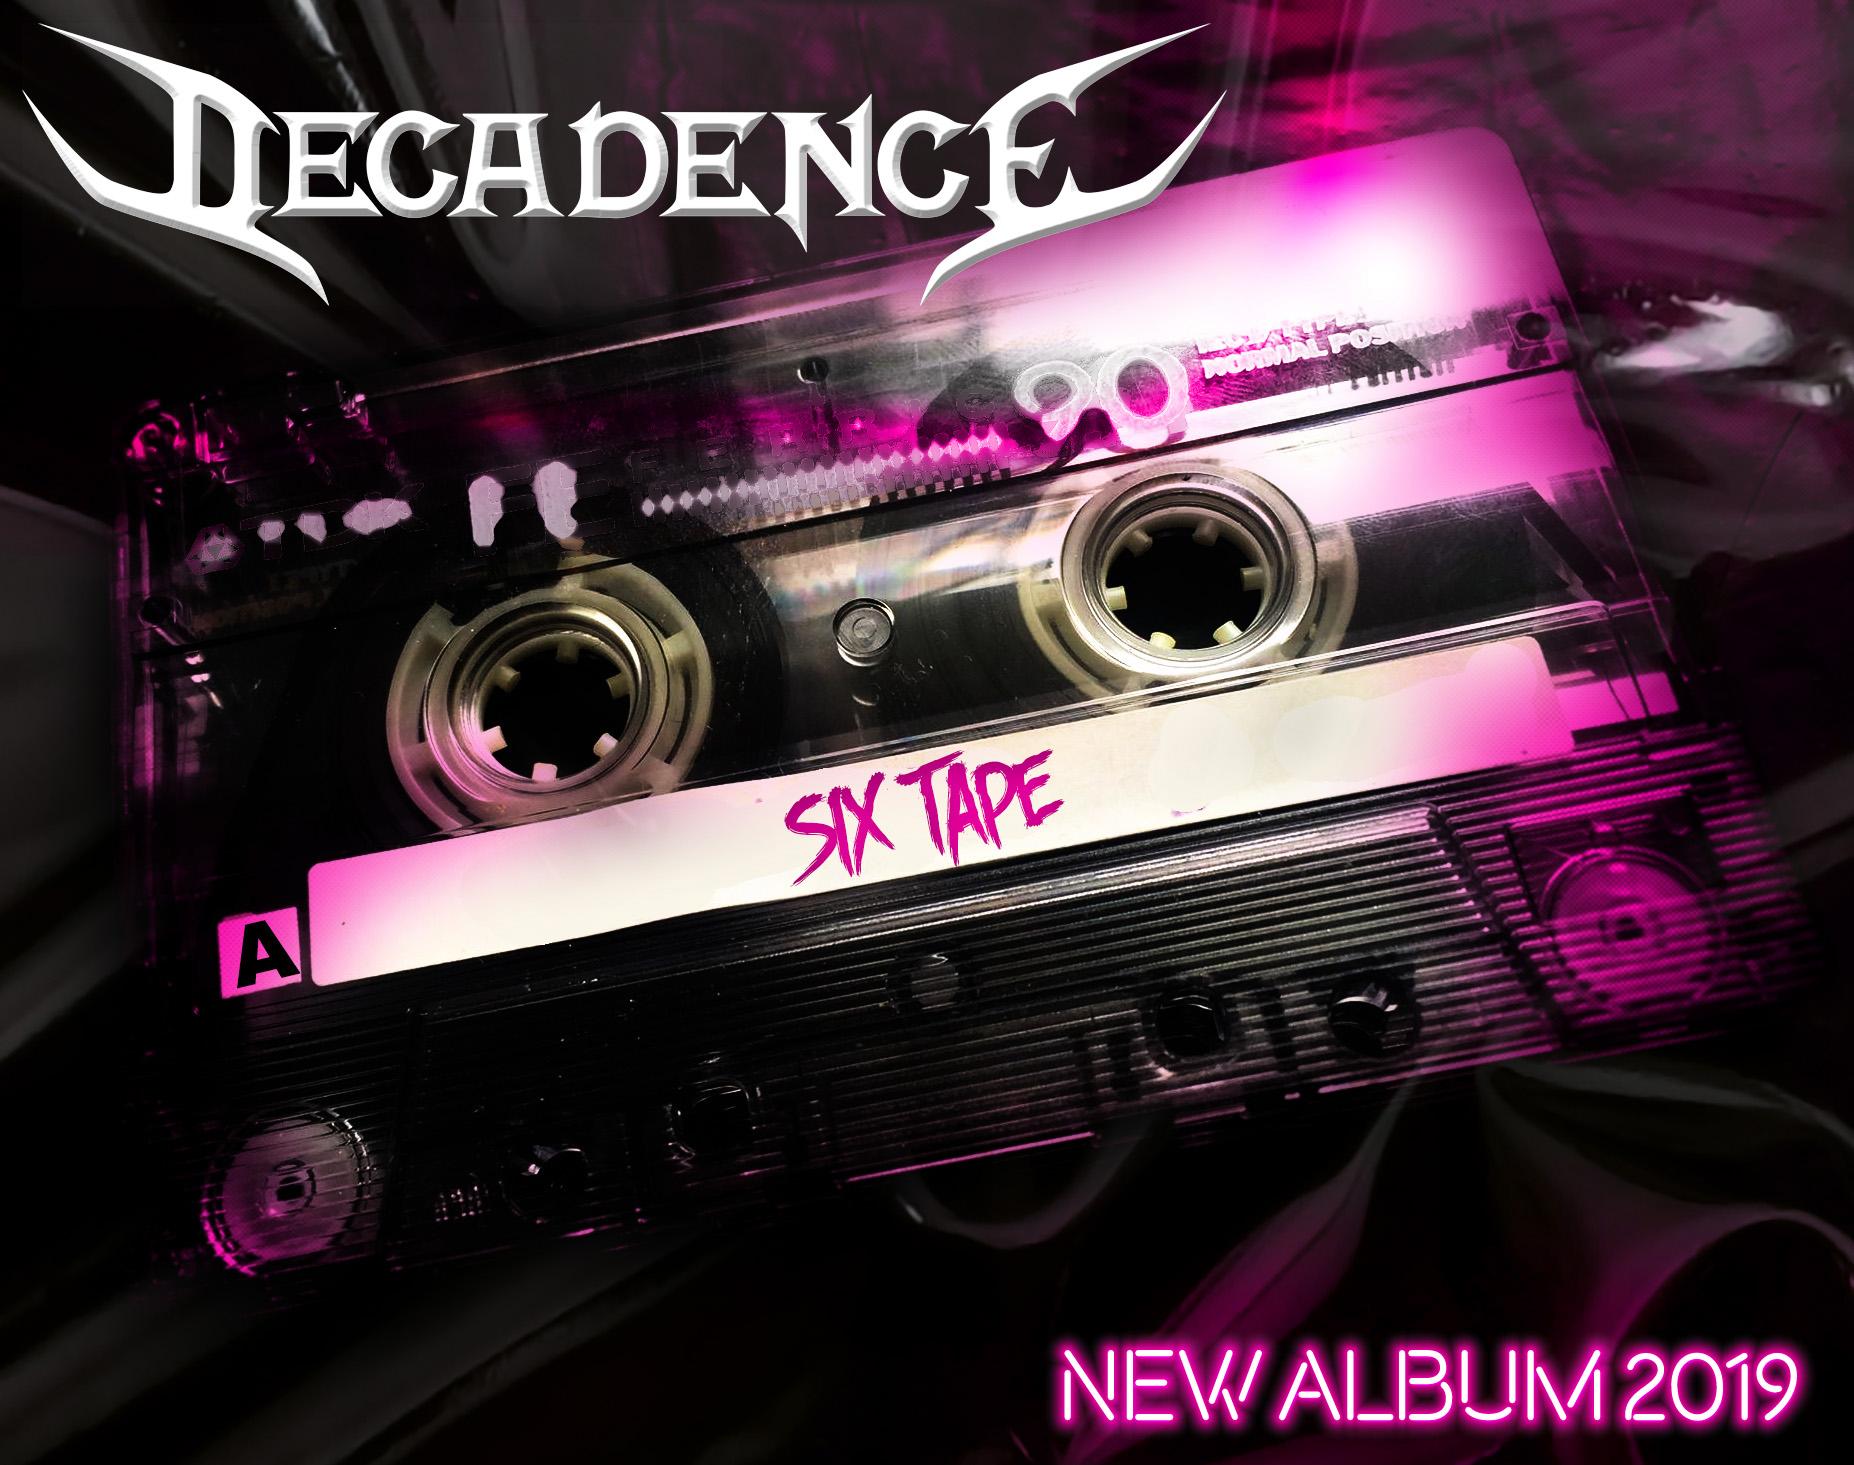 Decadence Sweden New Album Six Tape 2019